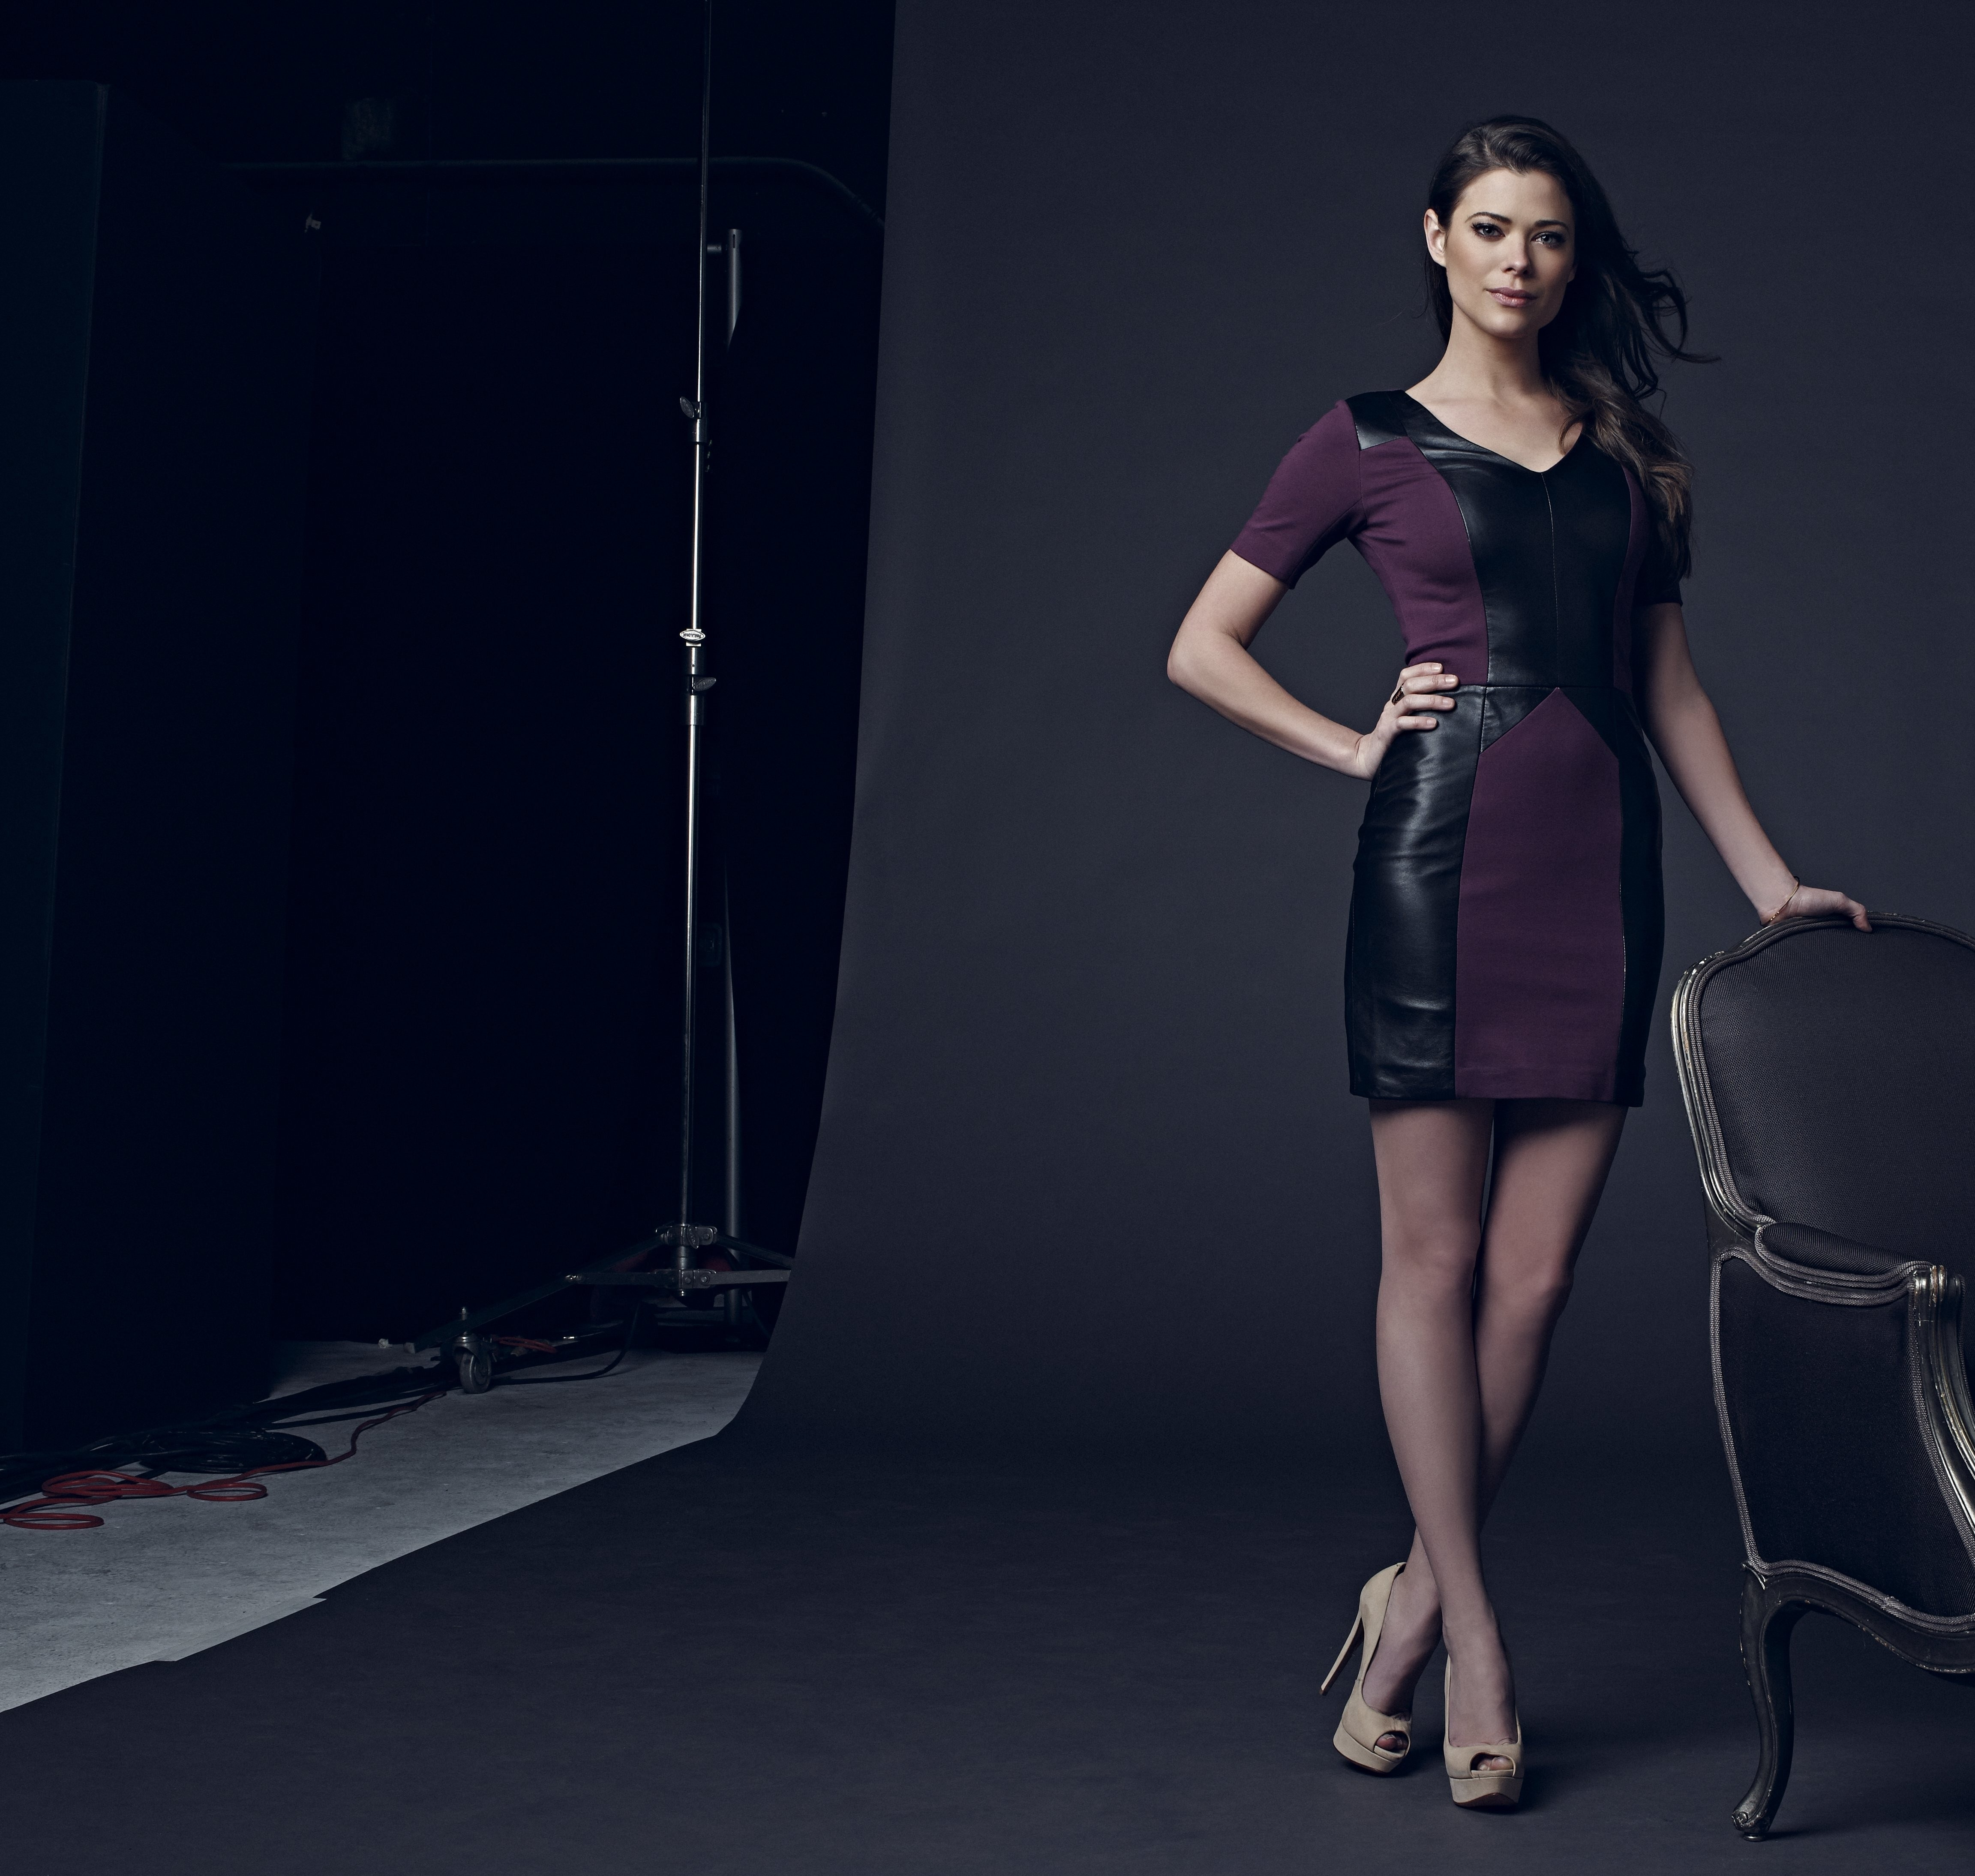 Peyton List (actress, born 1986)